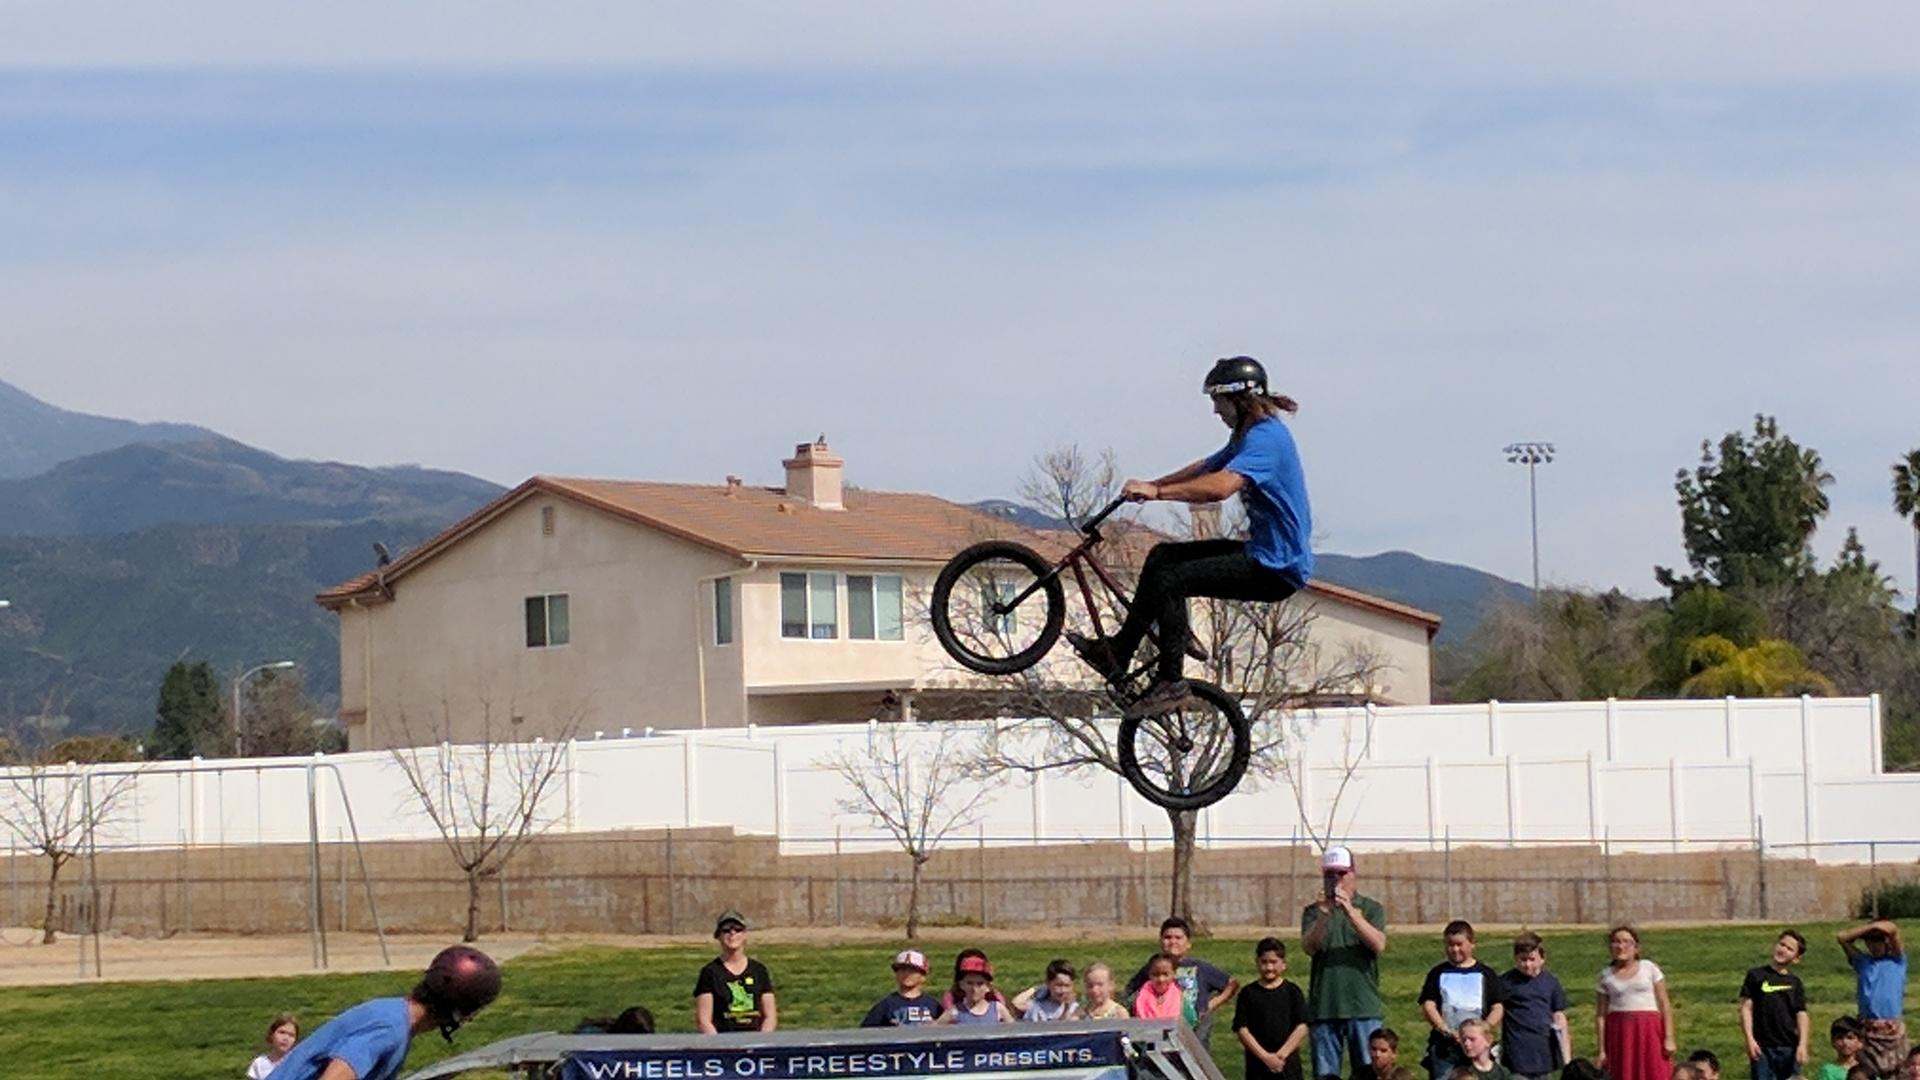 BMX Freestyle assembly